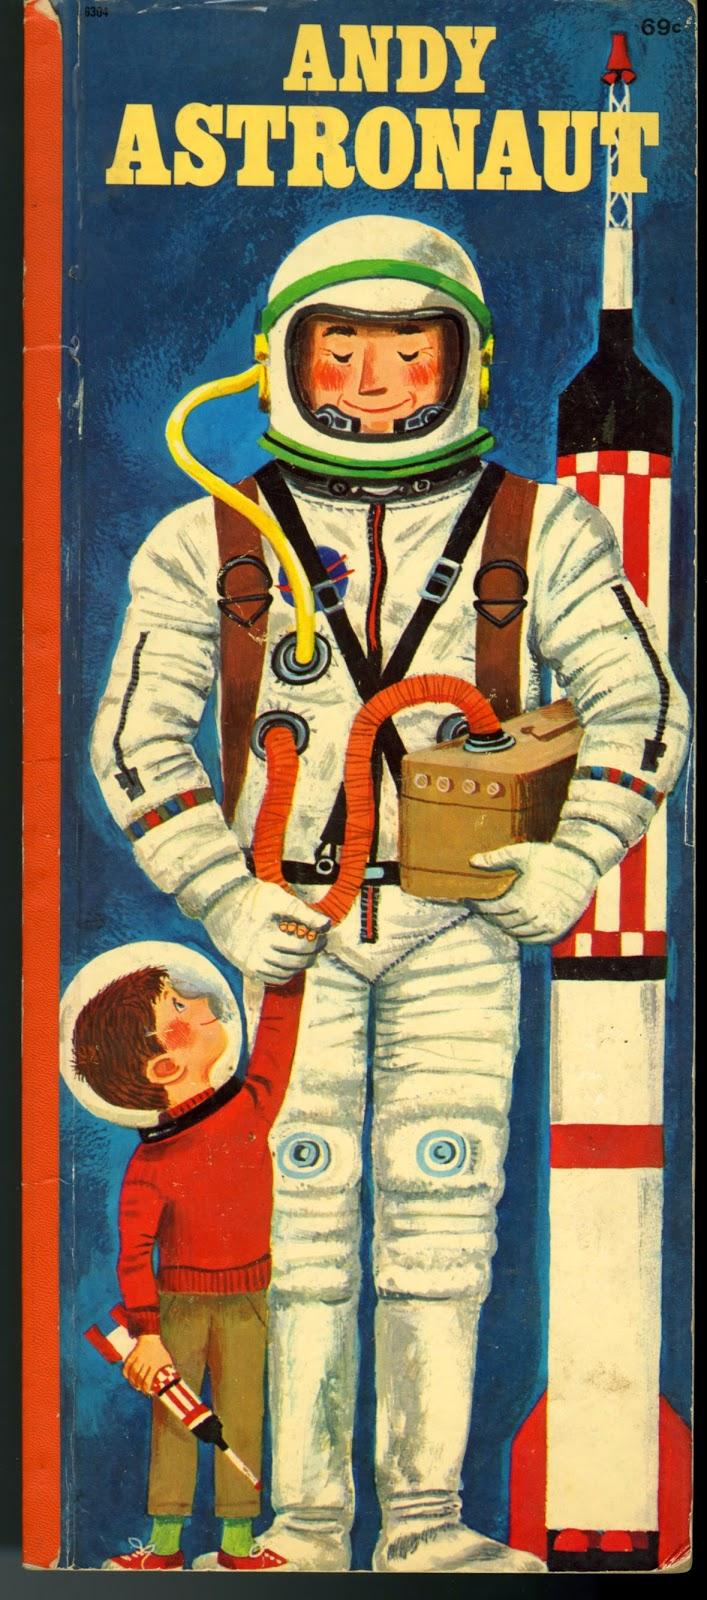 This Book Concerns Astronaut Vintage Illustration